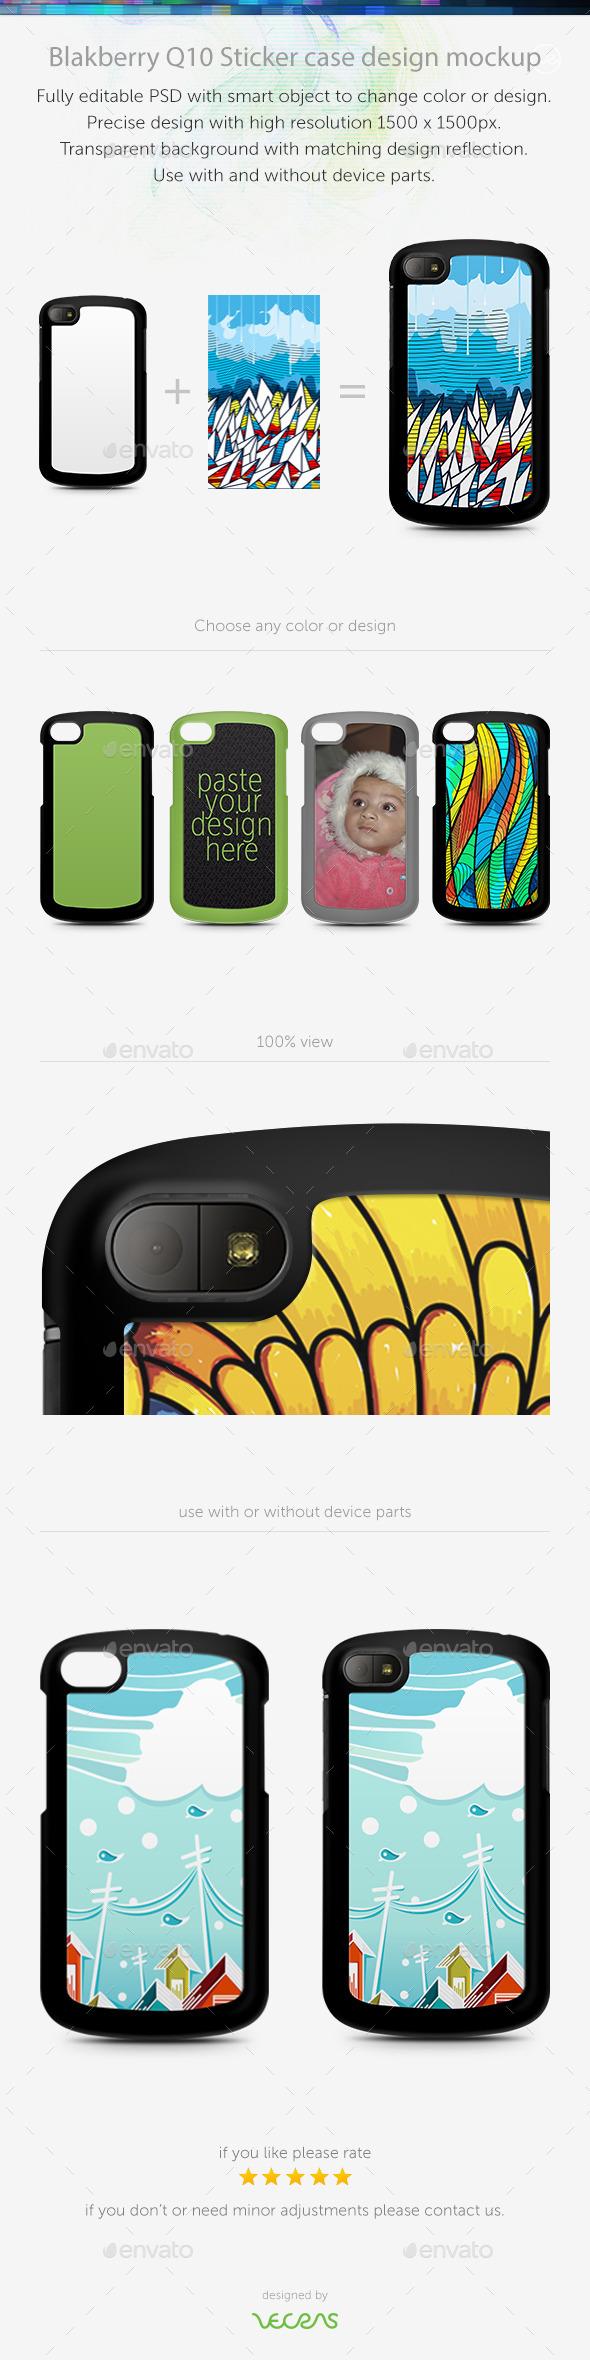 GraphicRiver Blakberry Q10 Sticker Case Design Mockup 10793913